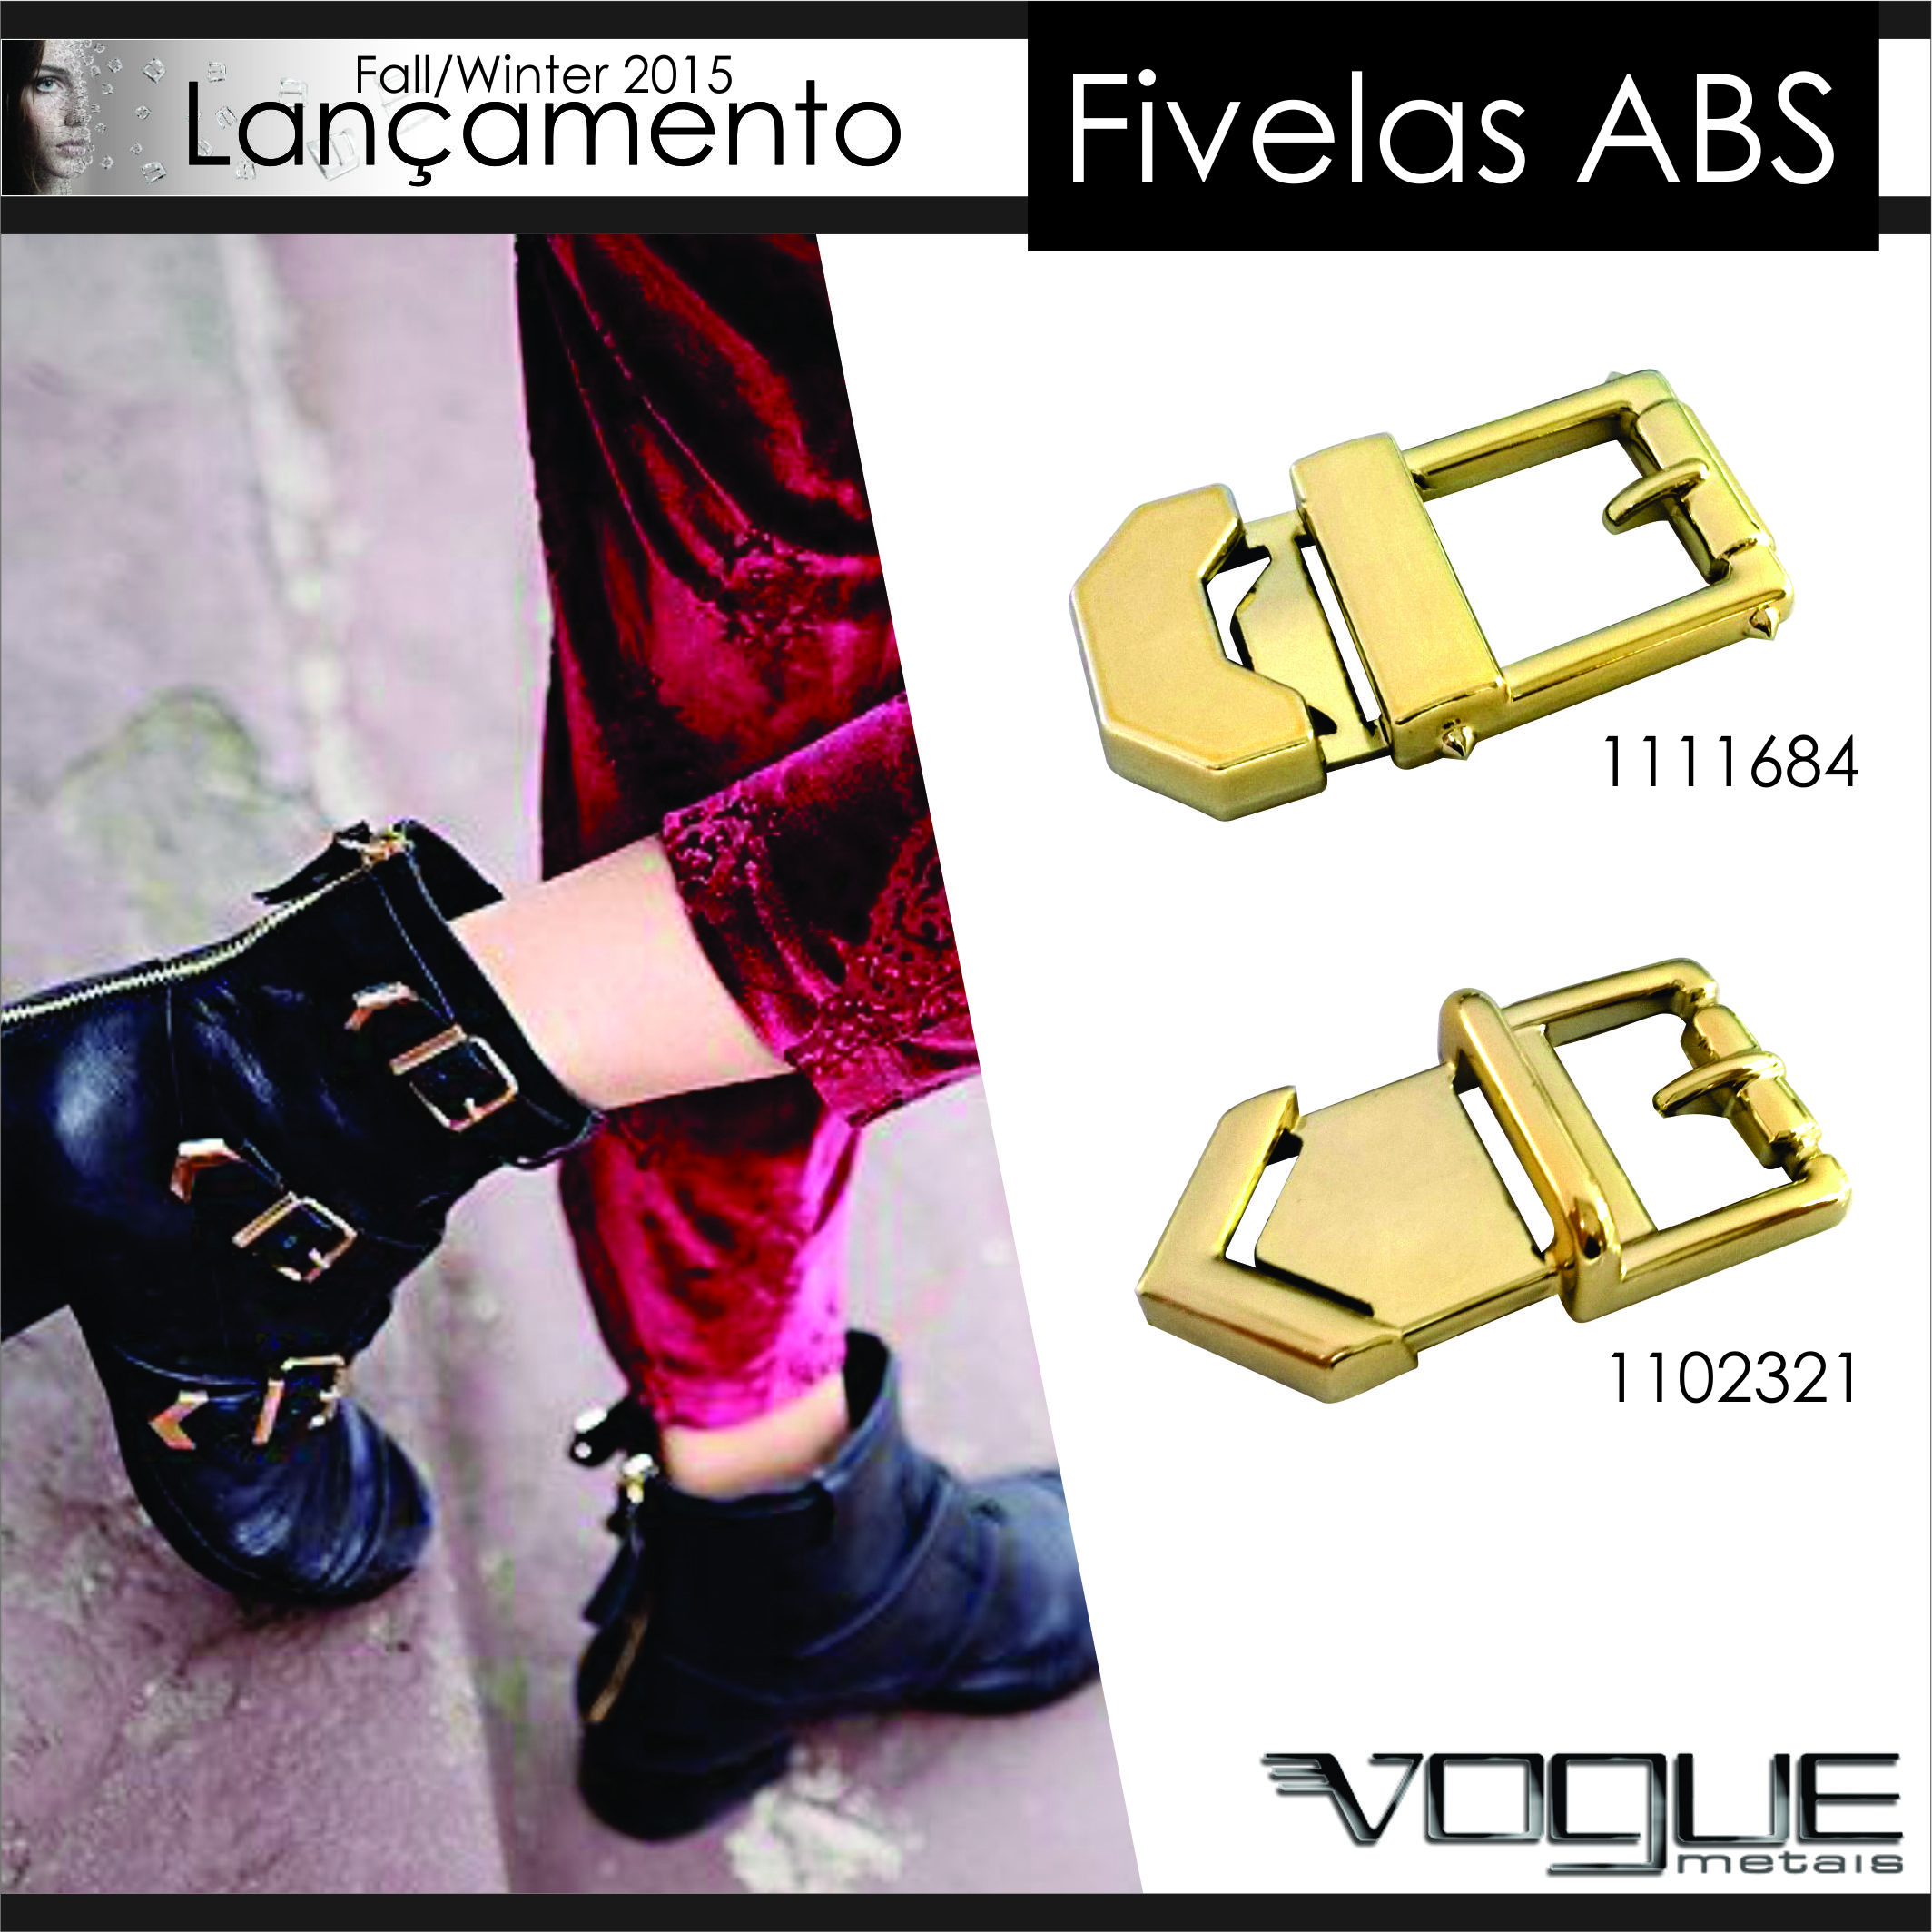 Fall/Winter 2015 - Vogue Metais - Fivelas ABS